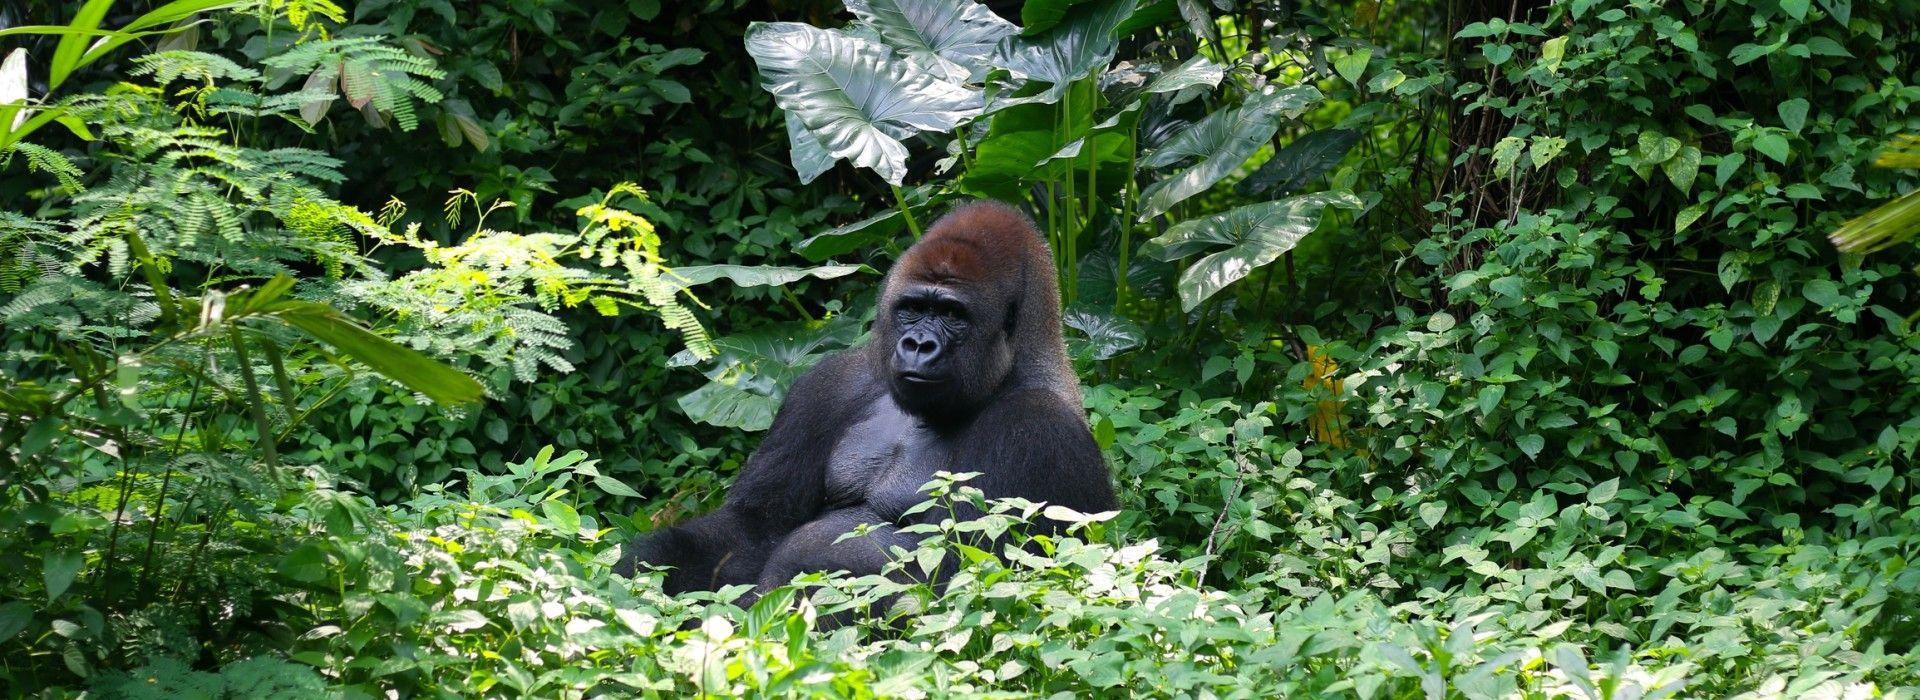 Rainforest and jungle visits Tours in Rwanda